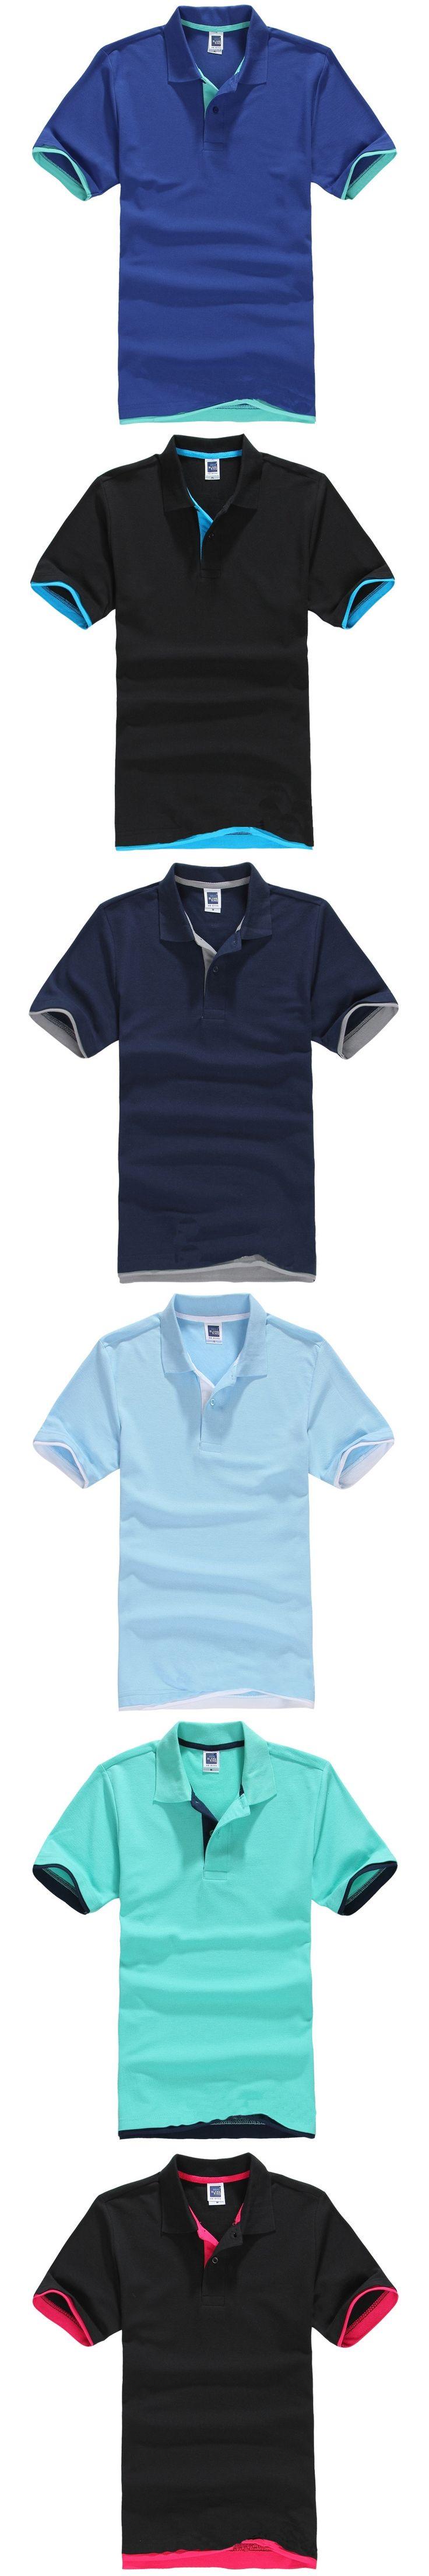 men polo shirts 2015 cheap polo shirts for men polo shirt brands Tops  Cotton men's solid color short-sleeved lapel polo